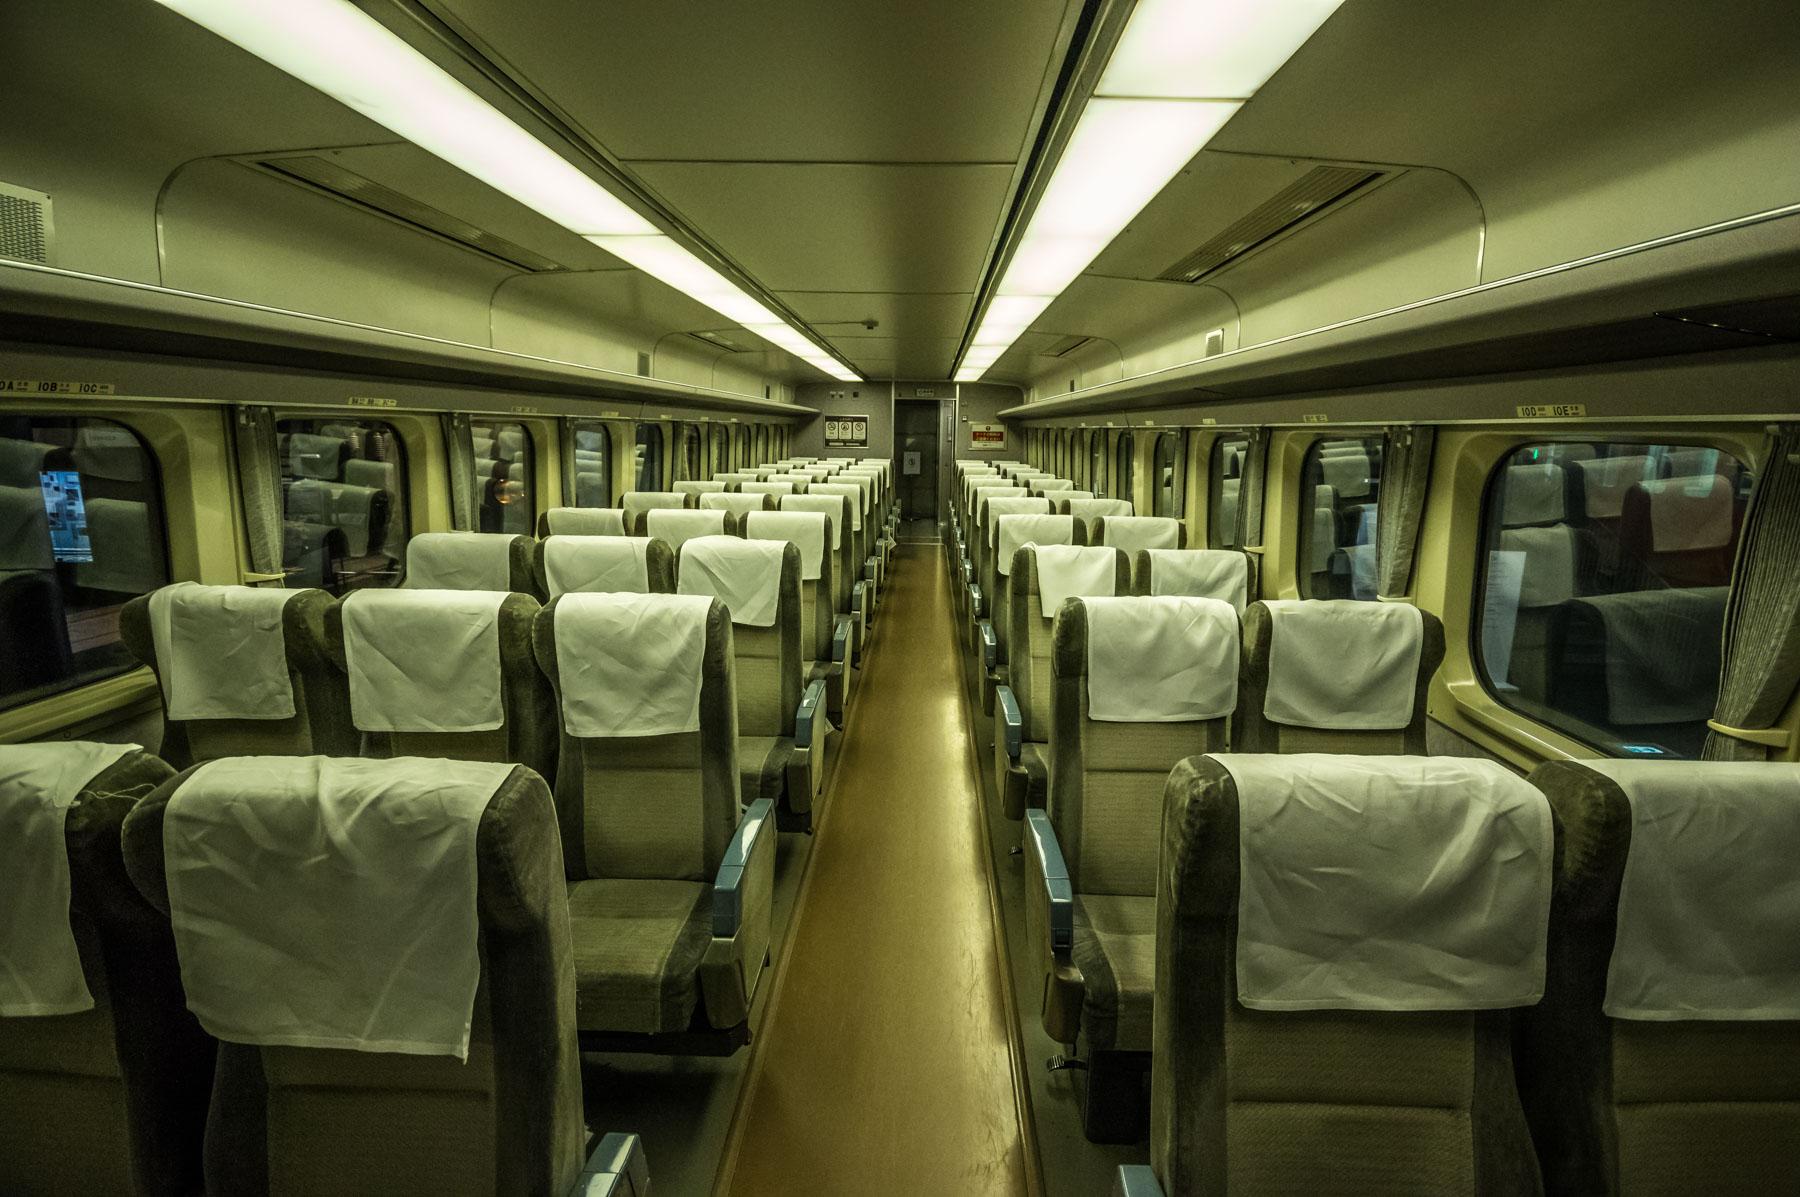 Inside one of the Shinkanasens